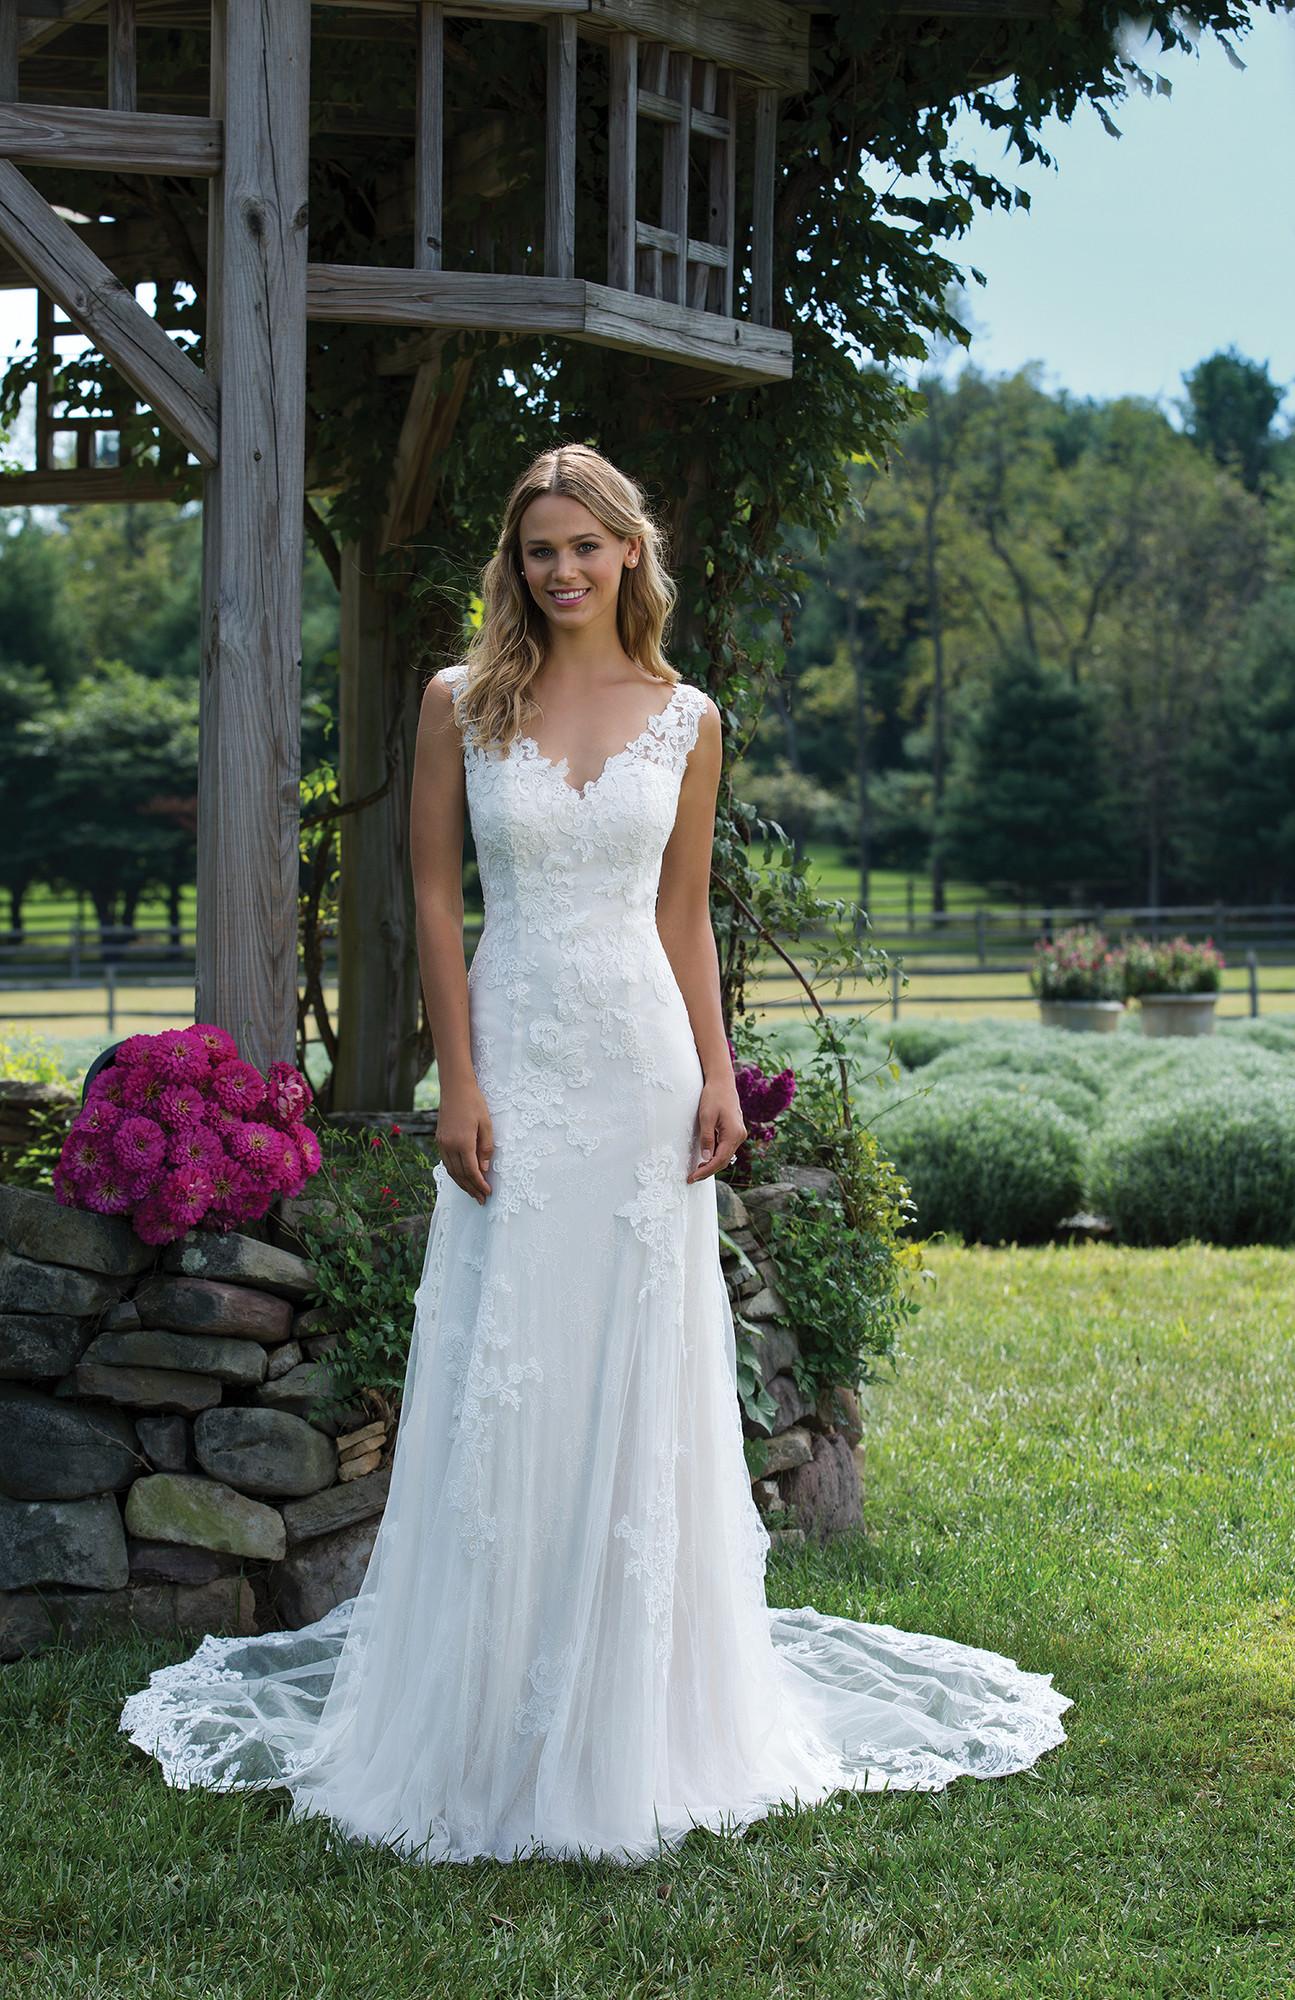 Wedding Dresses - Weddingwire.ca - photo #9